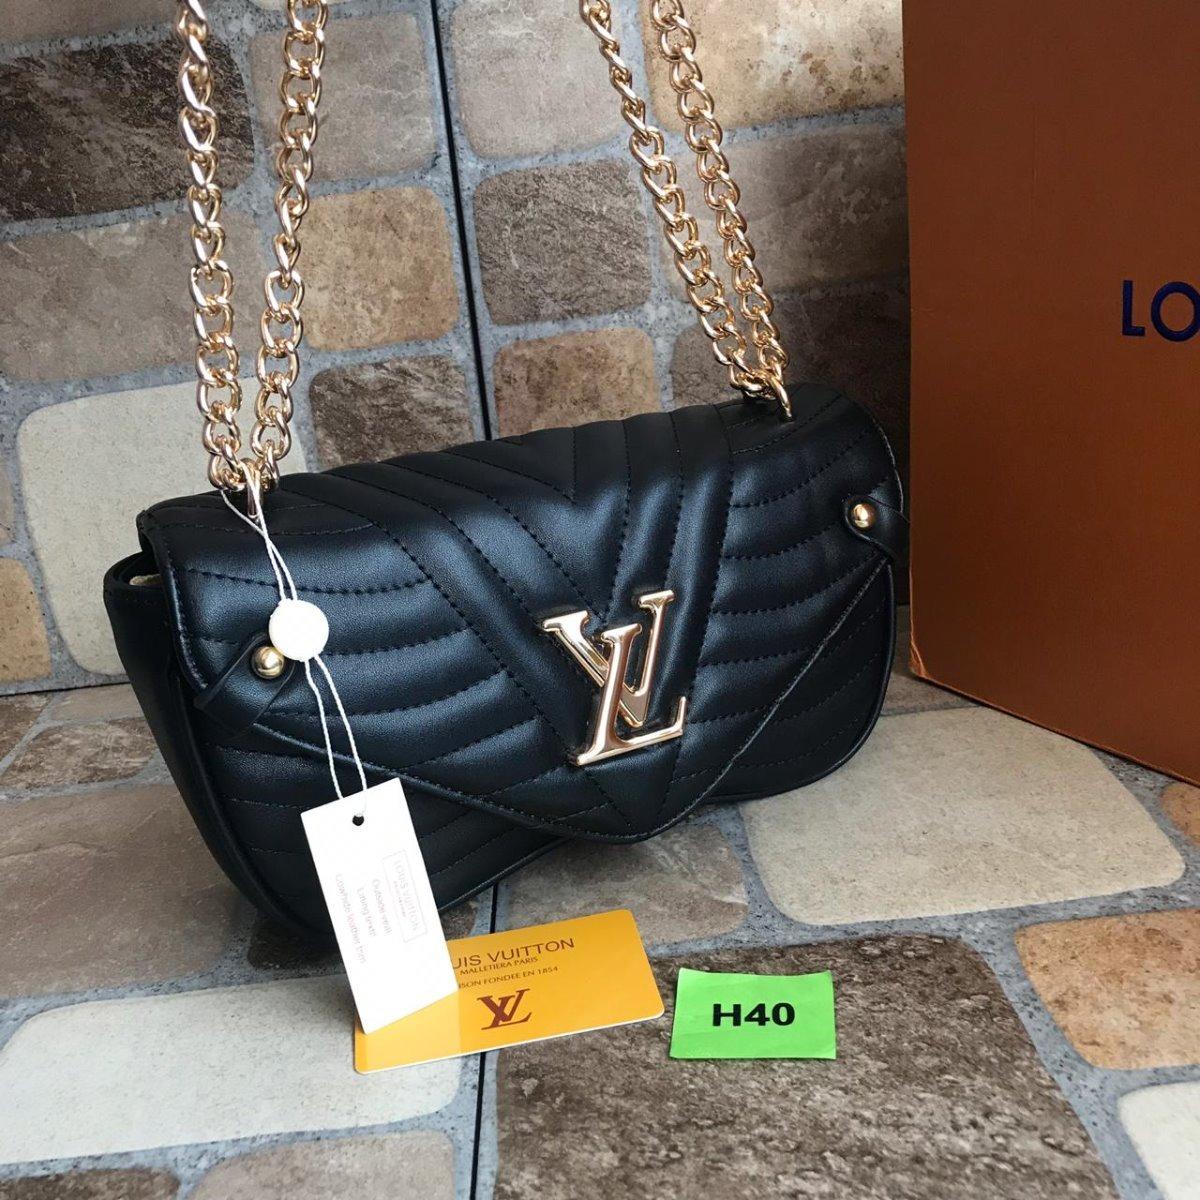 b6c7690b9 Bolso Bolsa Louis Vuitton New Wave Envio 24 Hrs Gratis - $ 1,600.00 ...